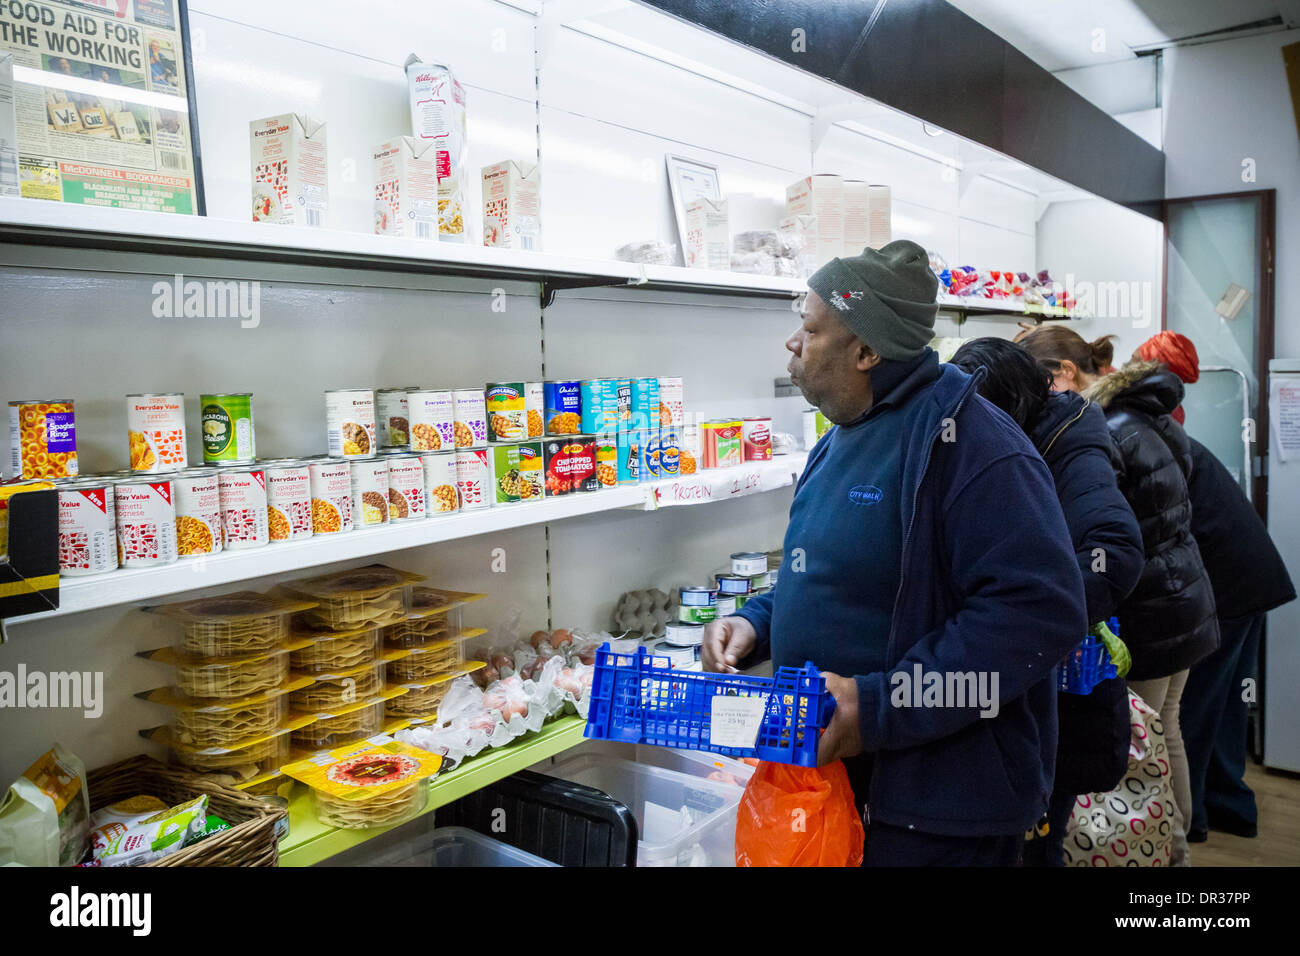 The Lewisham Food Bank In New Cross London Uk Stock Photo